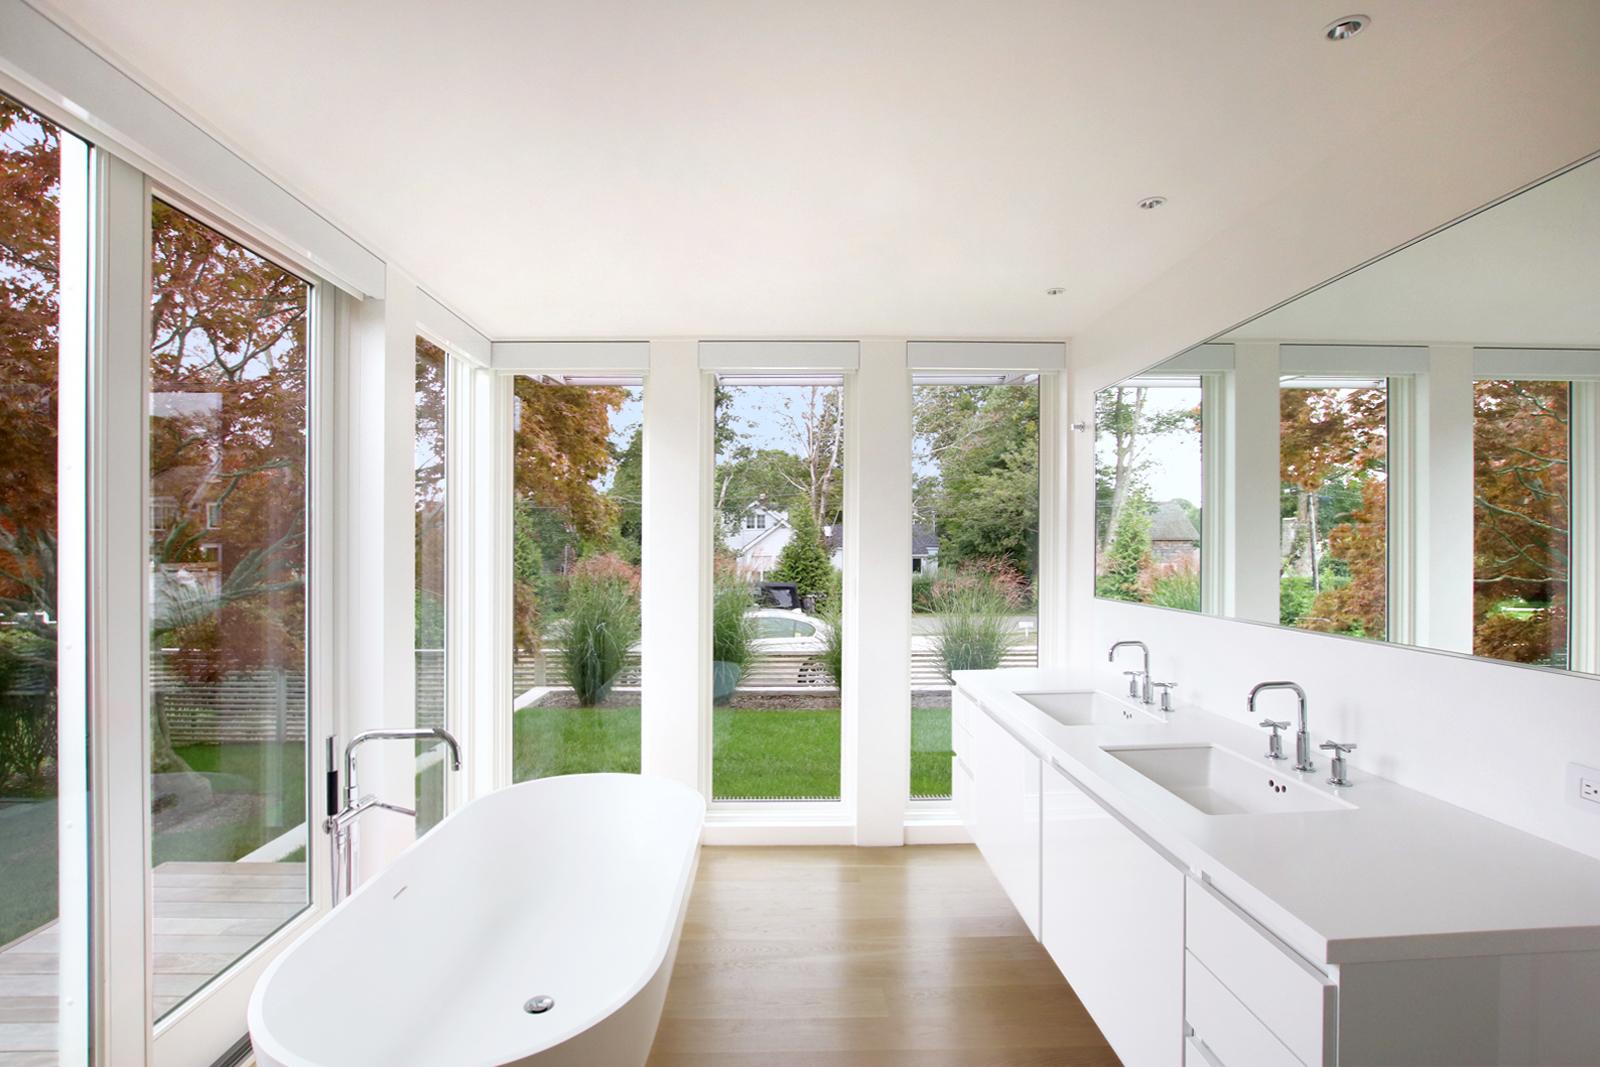 17-re4a-resolution-4-architecture-modern-modular-prefab-bridgehampton house-interior-master-bath-room-shades-opened.jpg